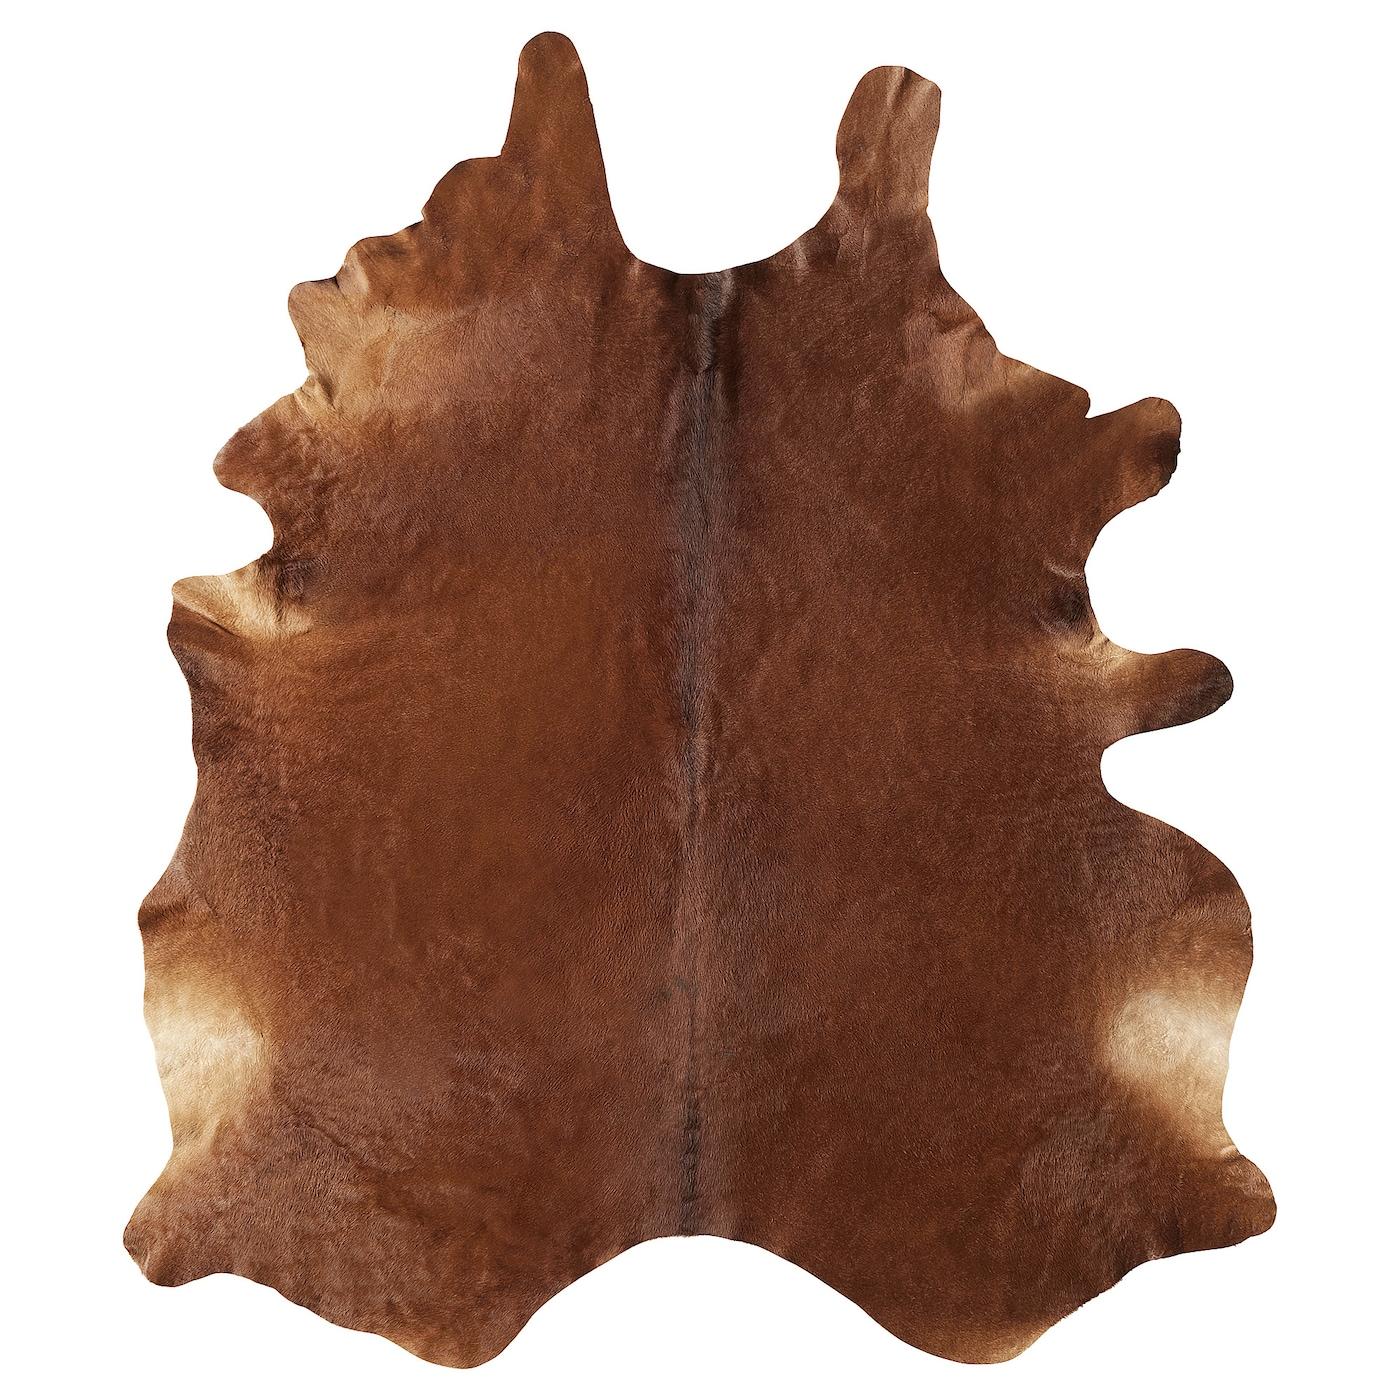 Shop KOLDBY Brown Cowhide Rug from Ikea on Openhaus